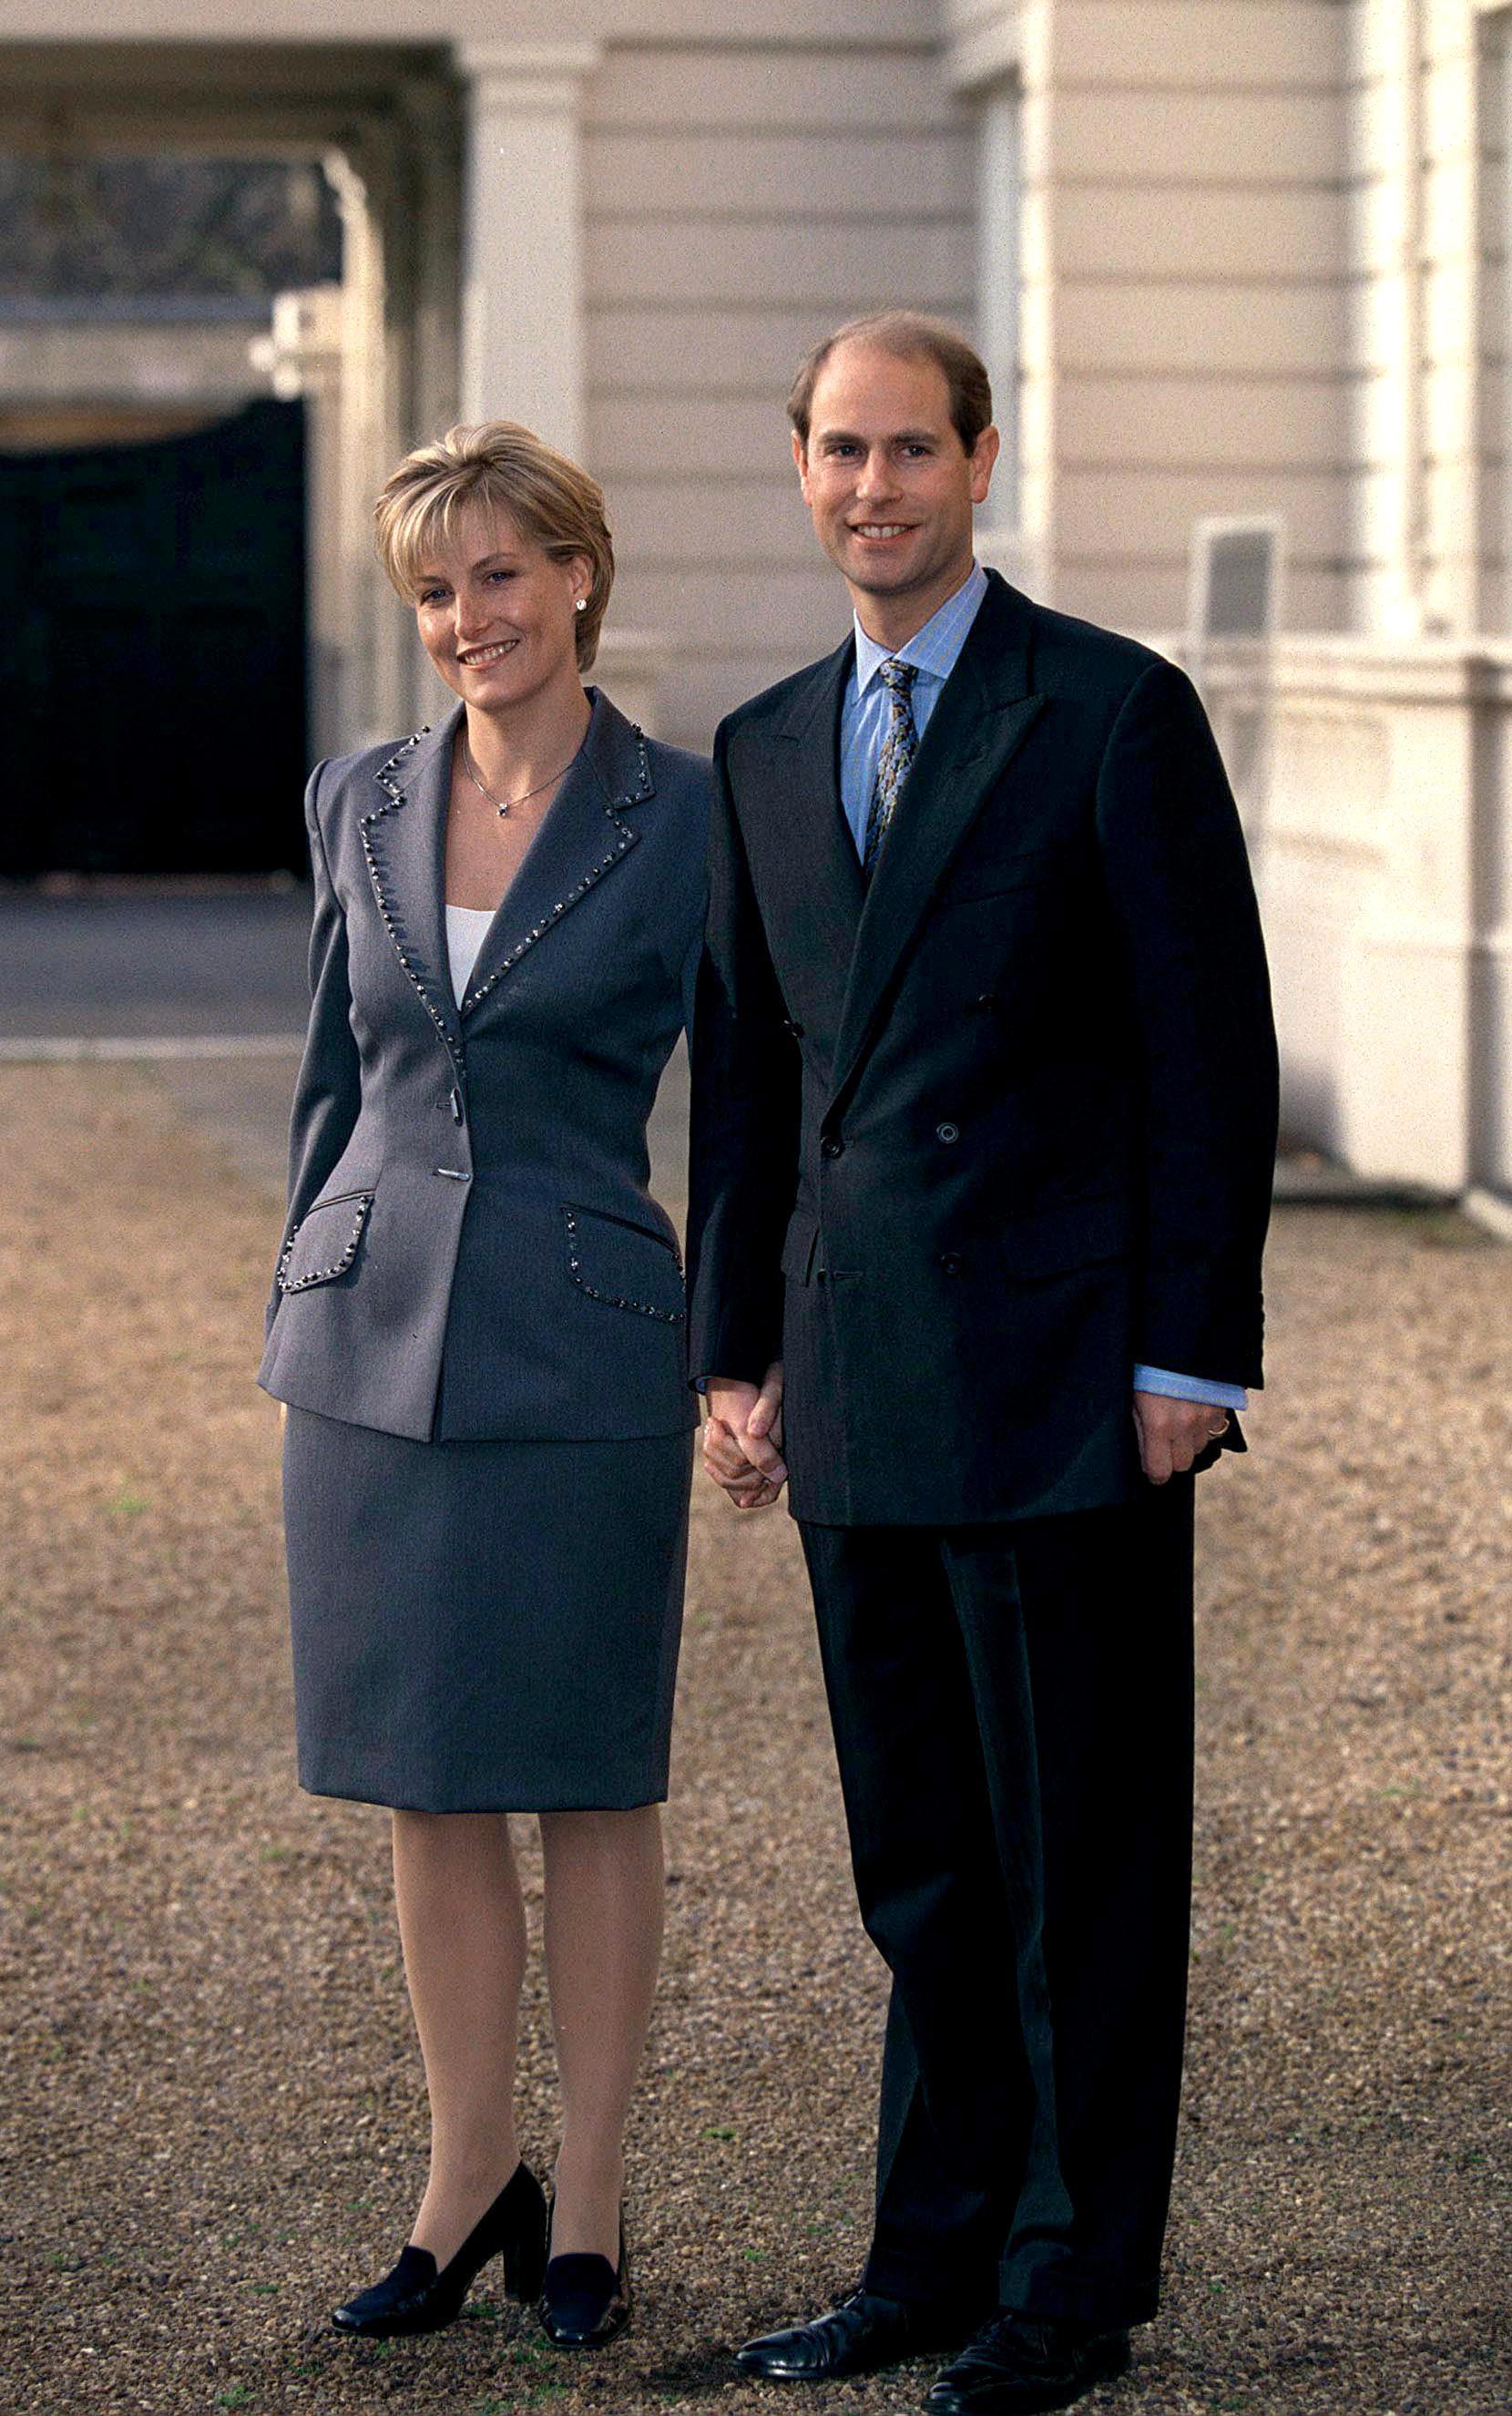 Prince Edward and Sophie Rhys-Jones engagement photo